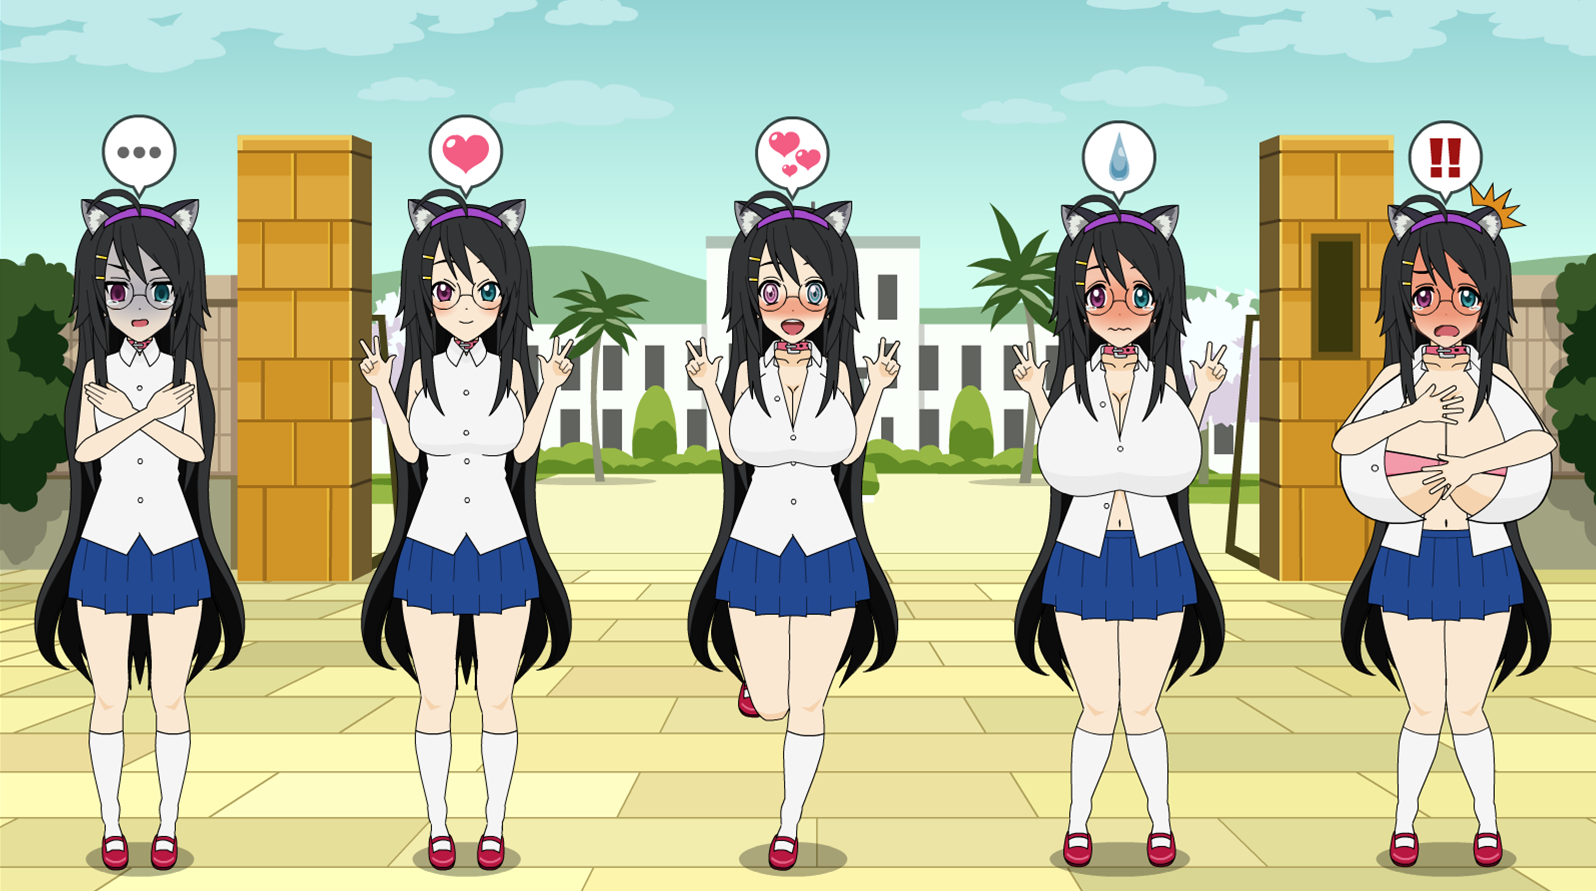 Anime Girl Growth minami growth spurtthe-god-of-hell on deviantart